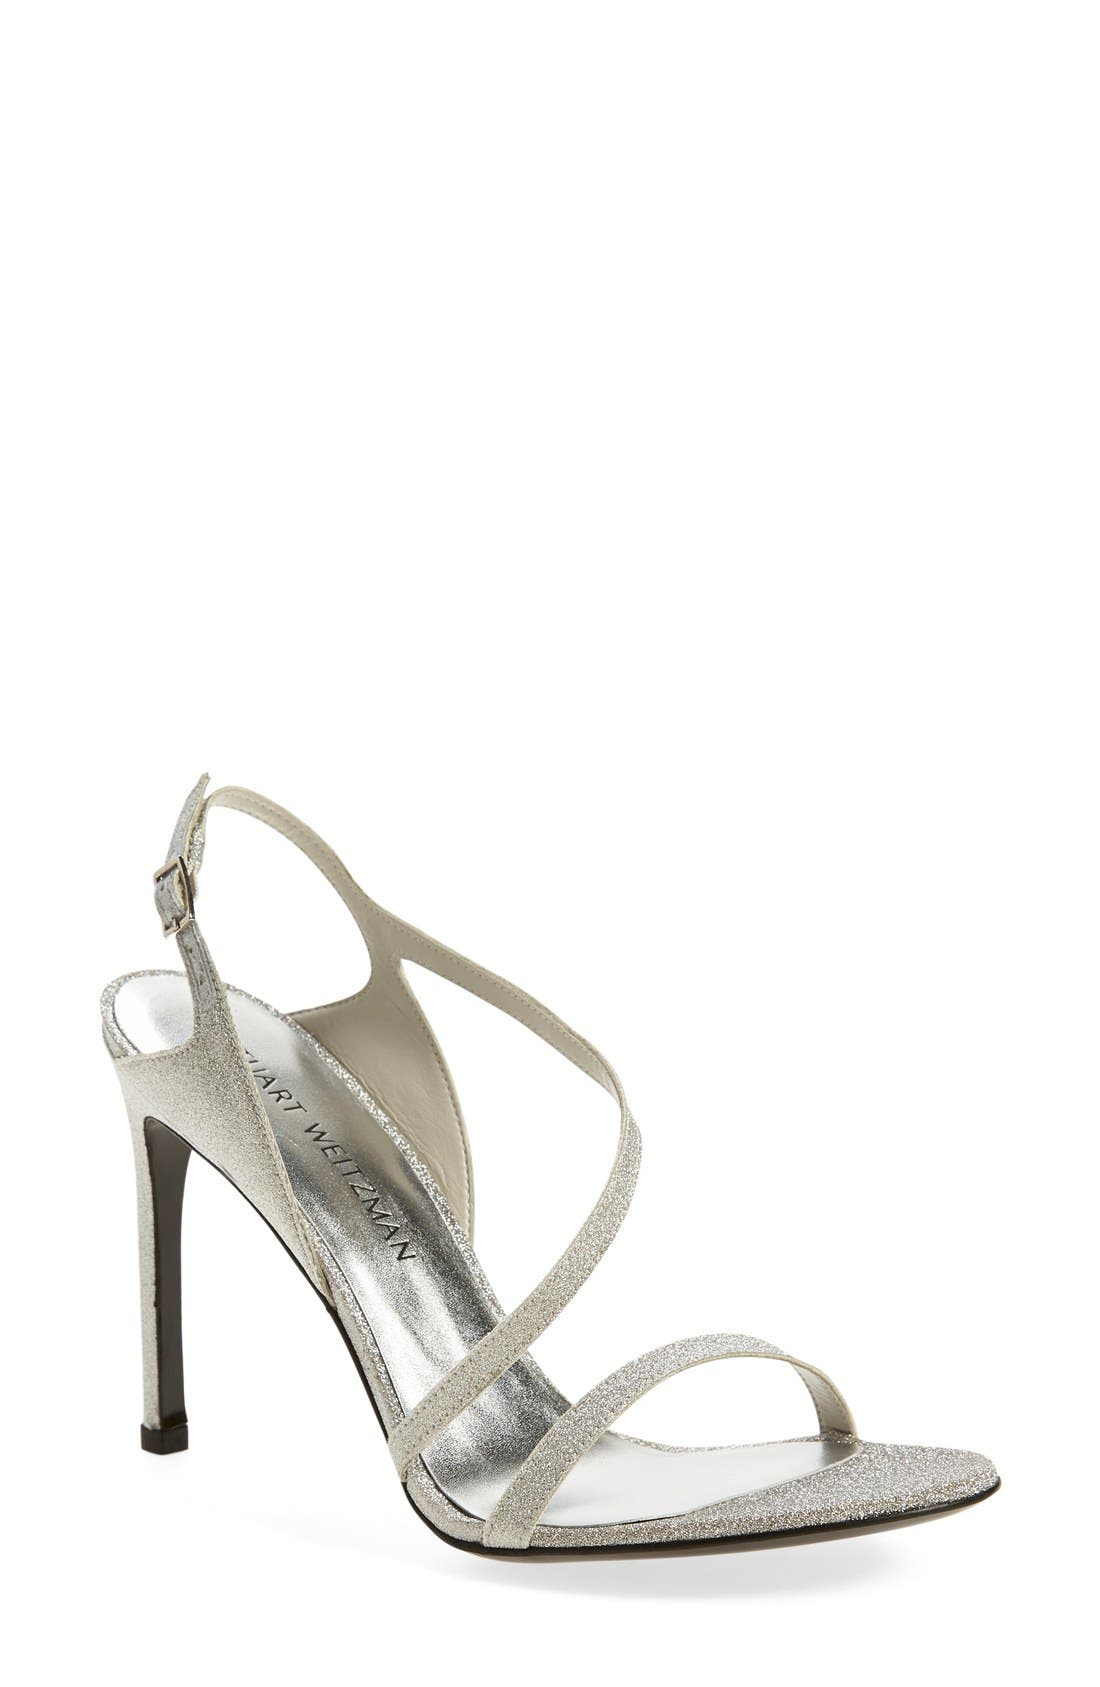 Main Image - Stuart Weitzman 'Sensual' Sandal (Women)